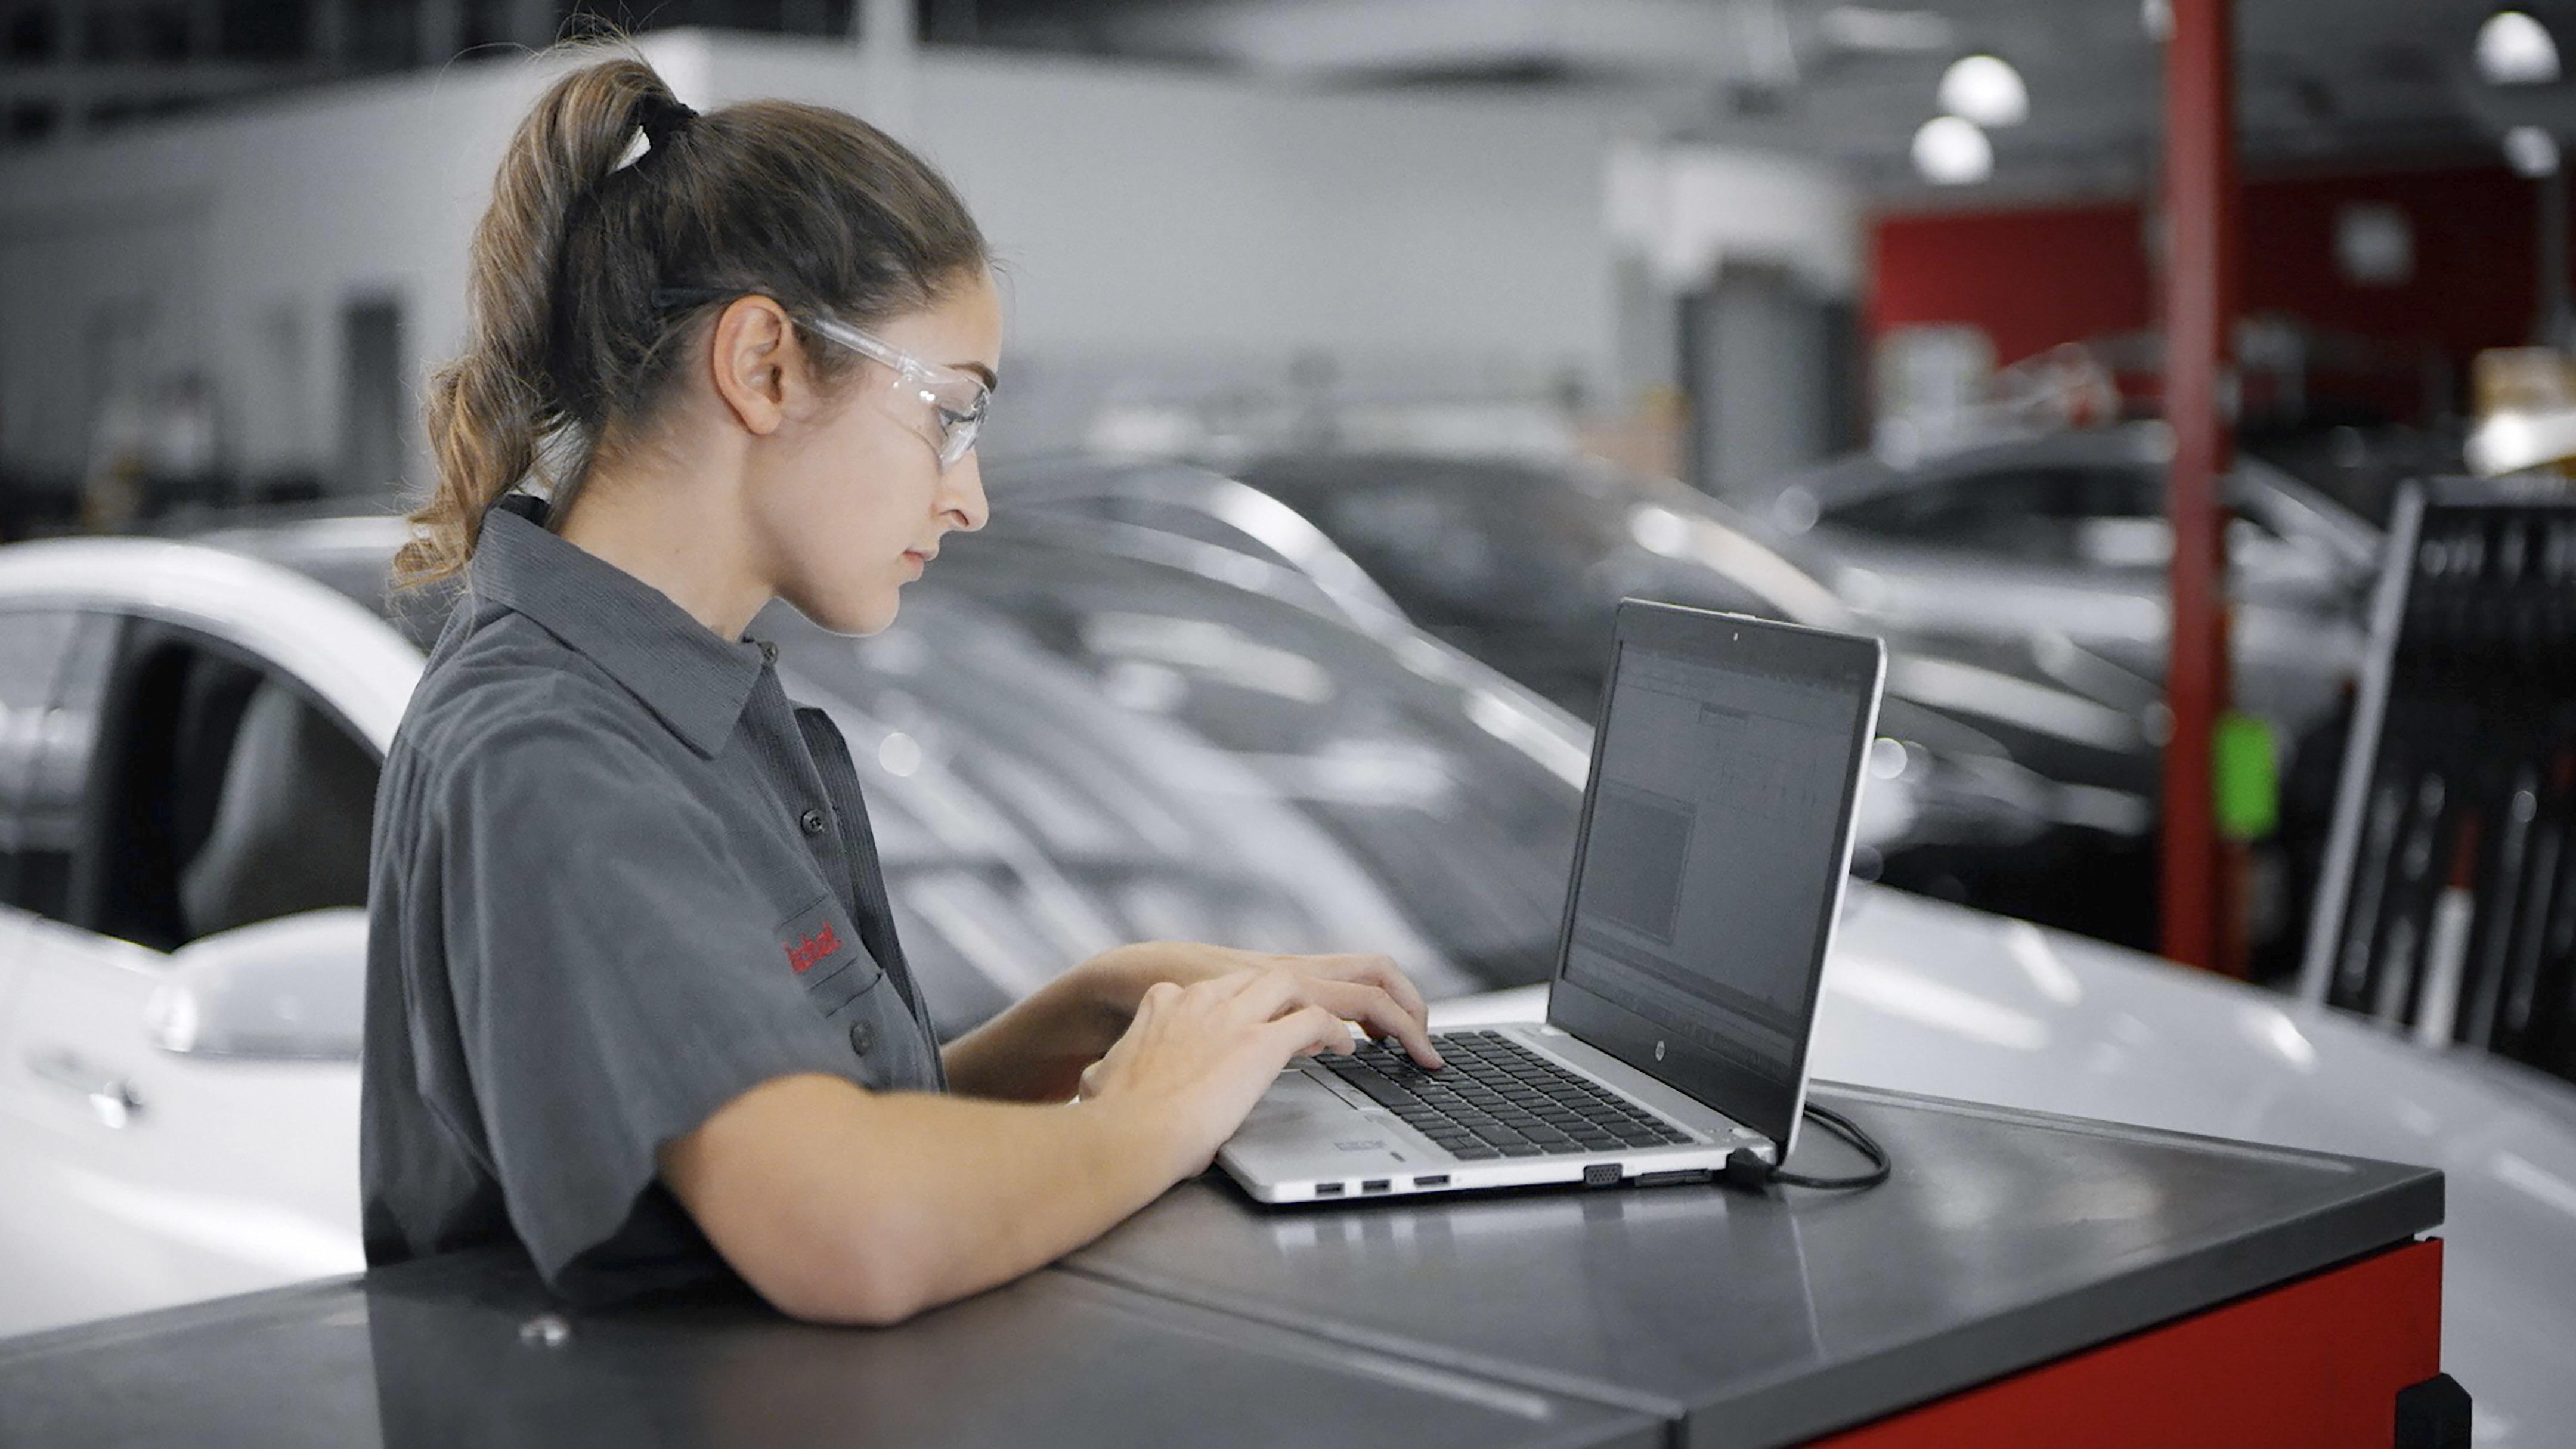 Female technician laptop print